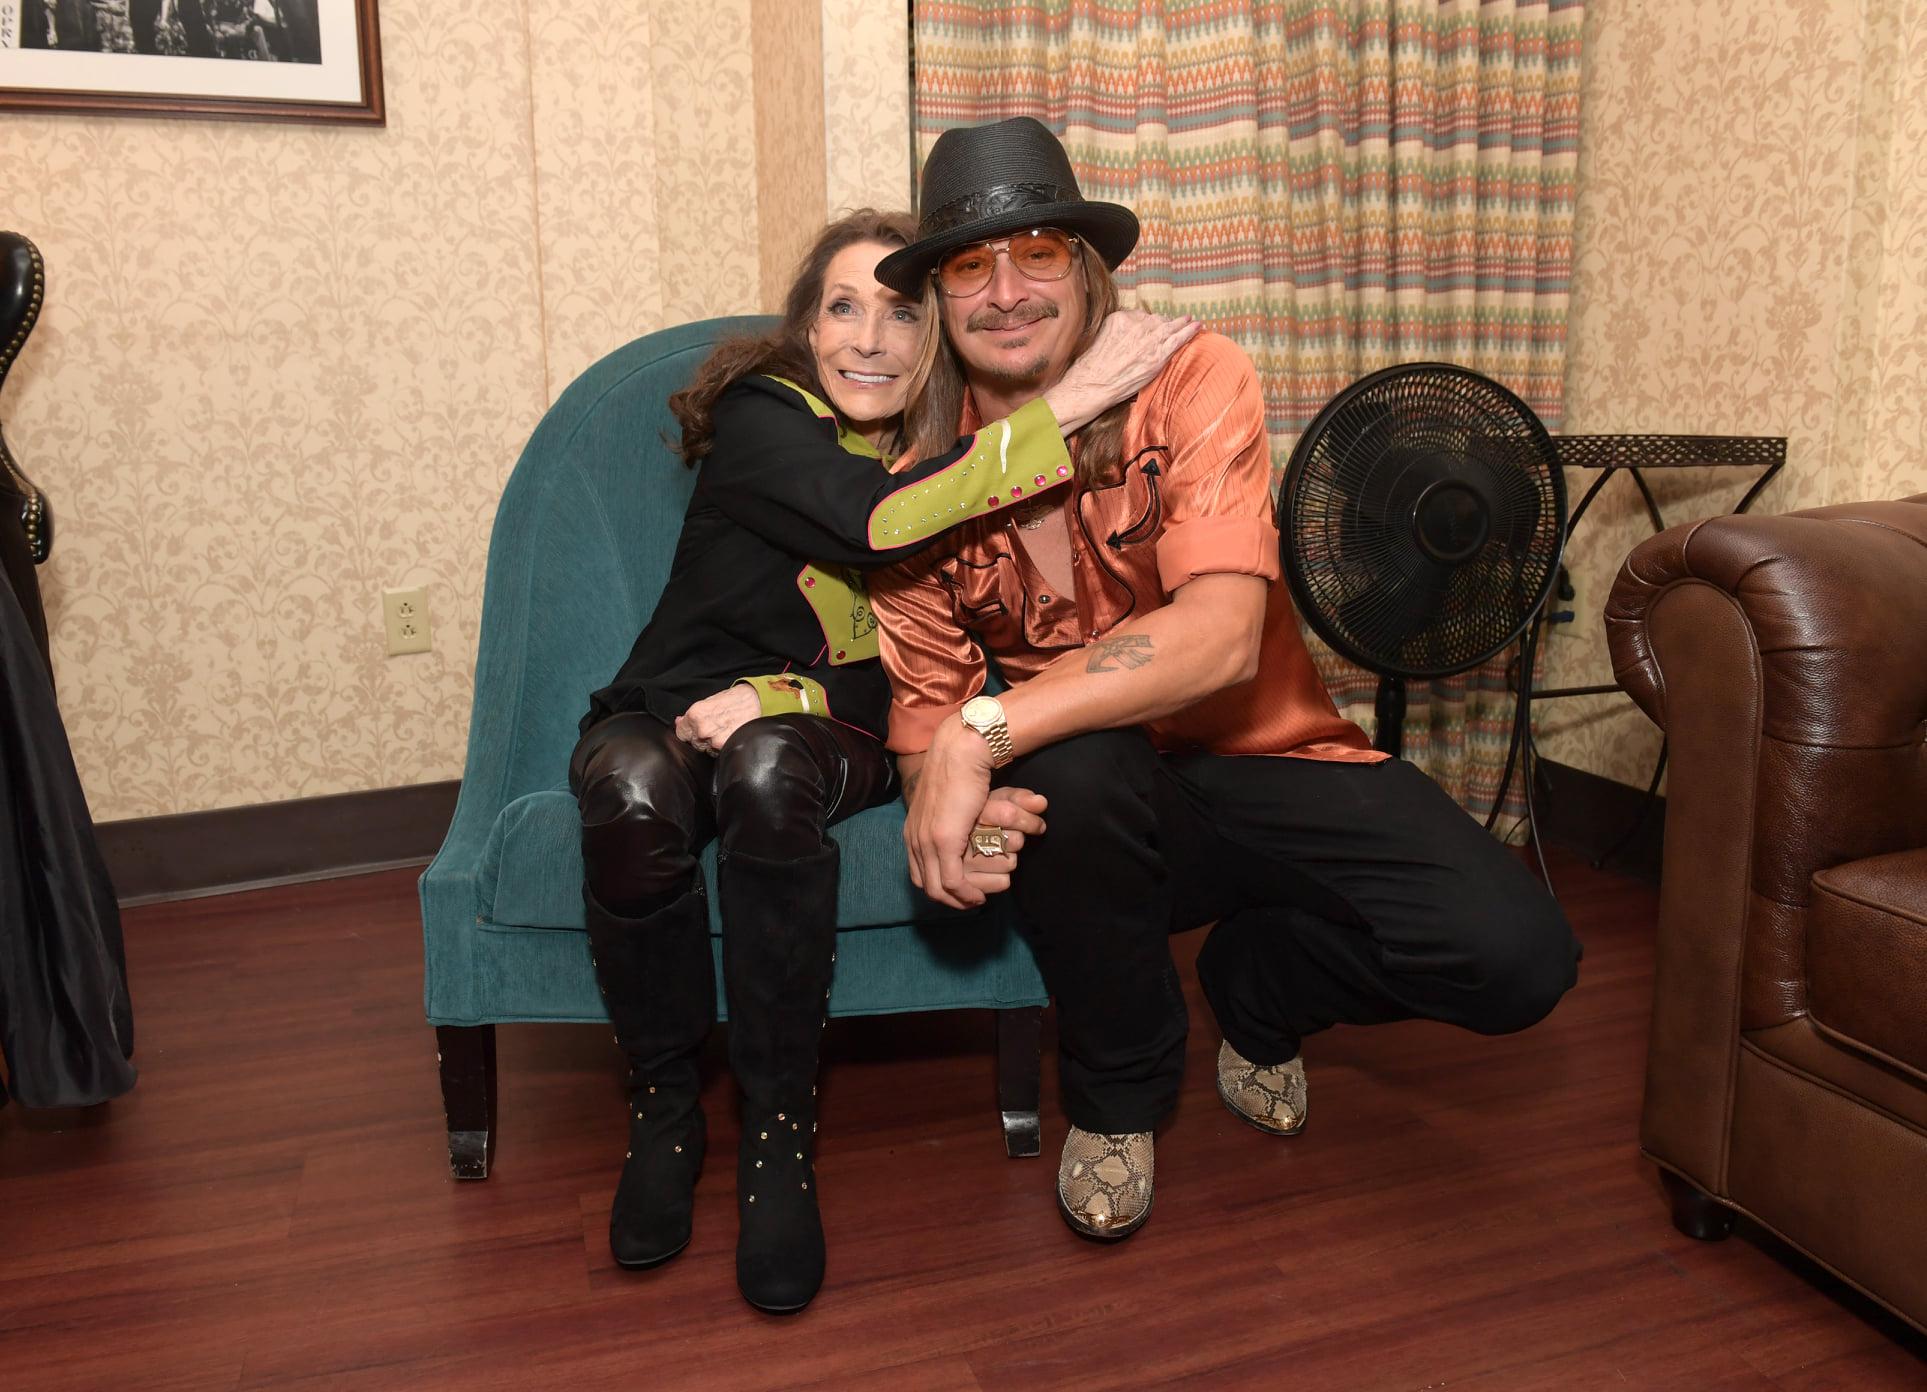 Kentucky natives Loretta Lynn and Josh Osborne awarded for songwriting